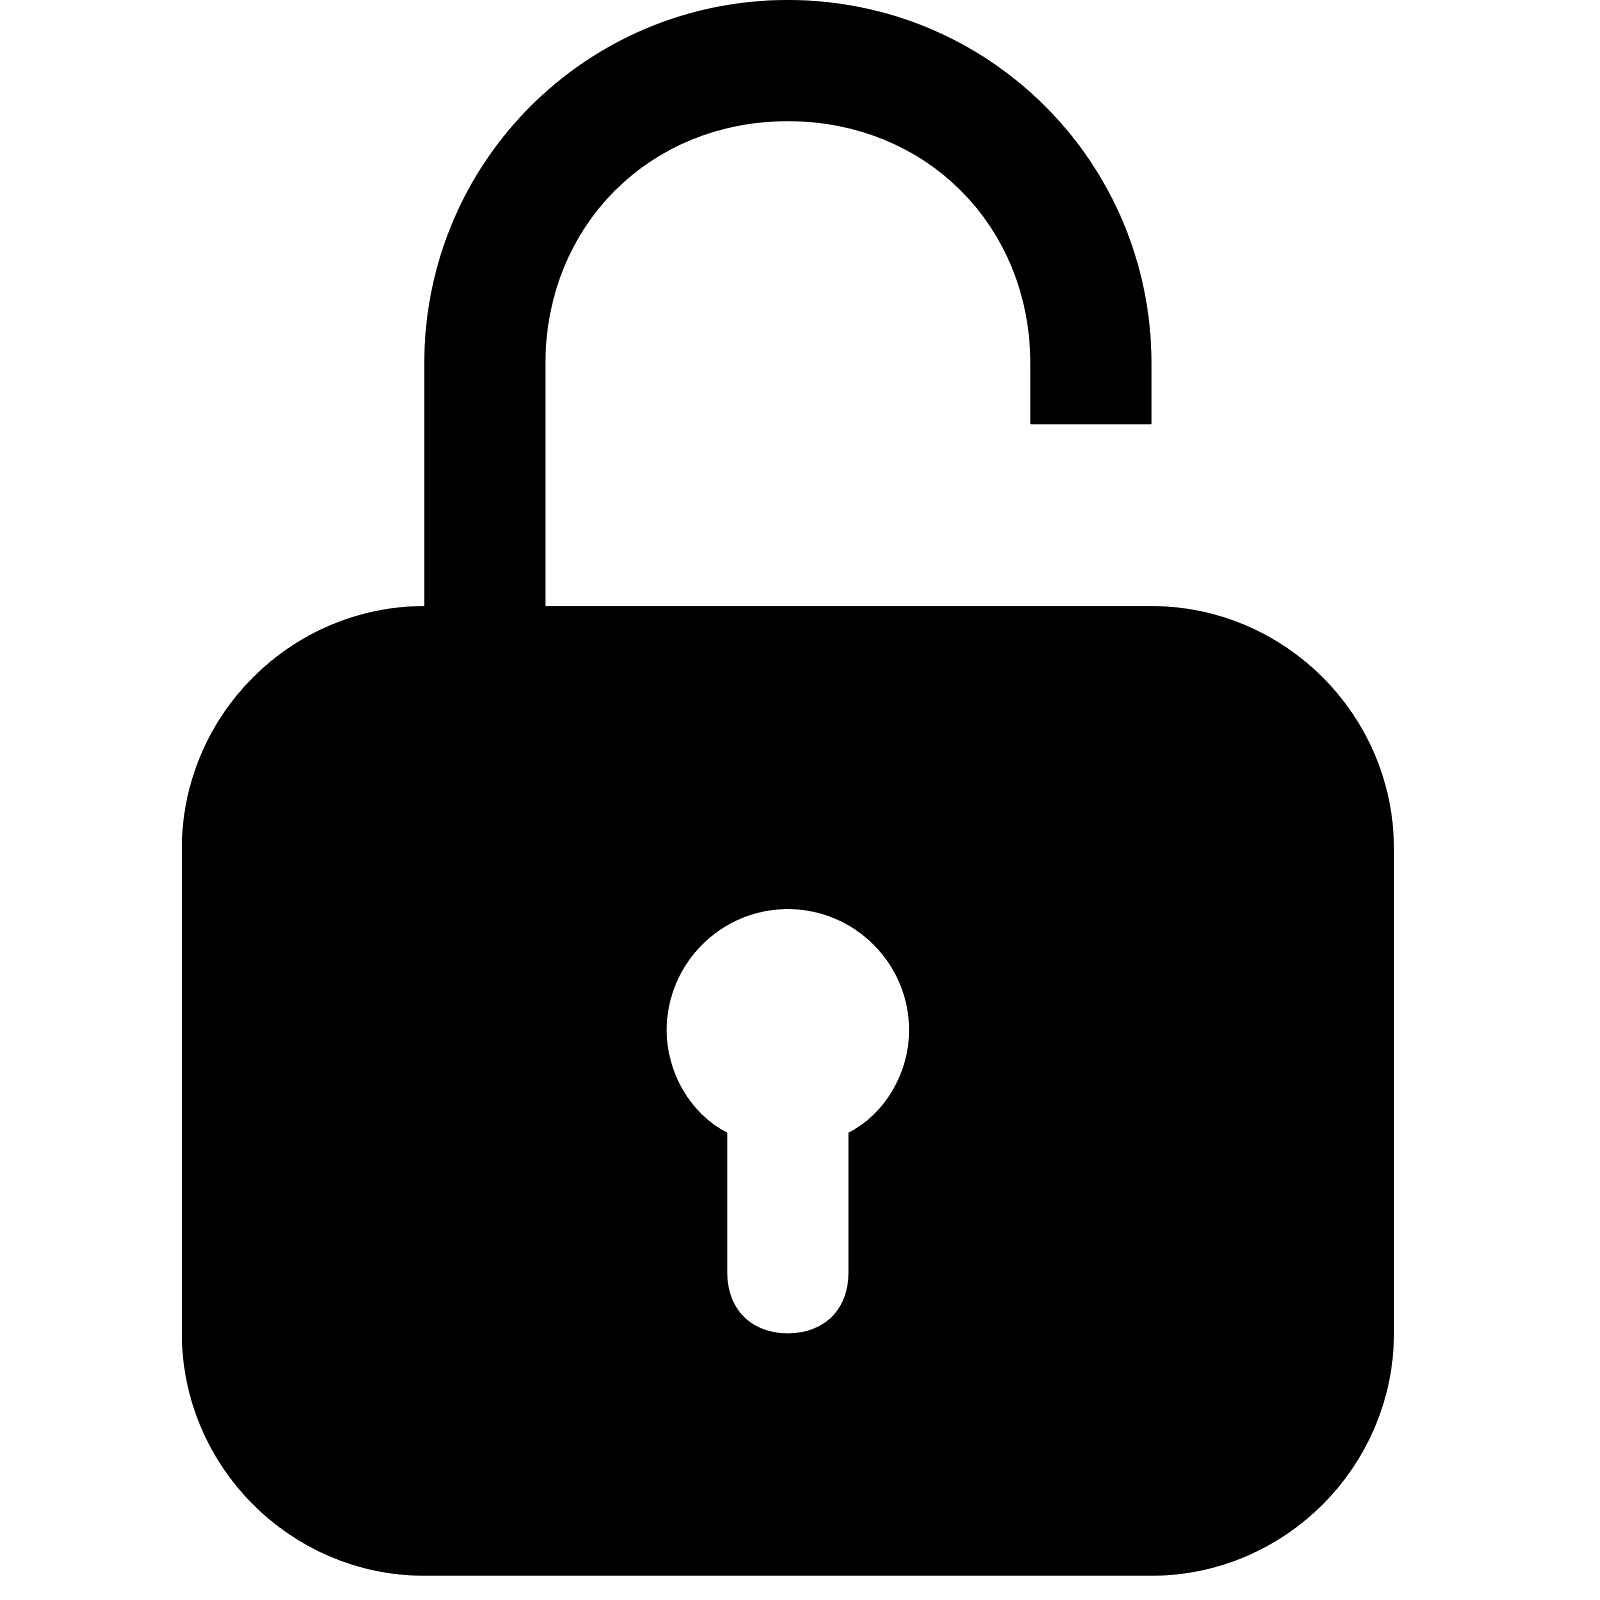 1600x1600 Unlock Icon